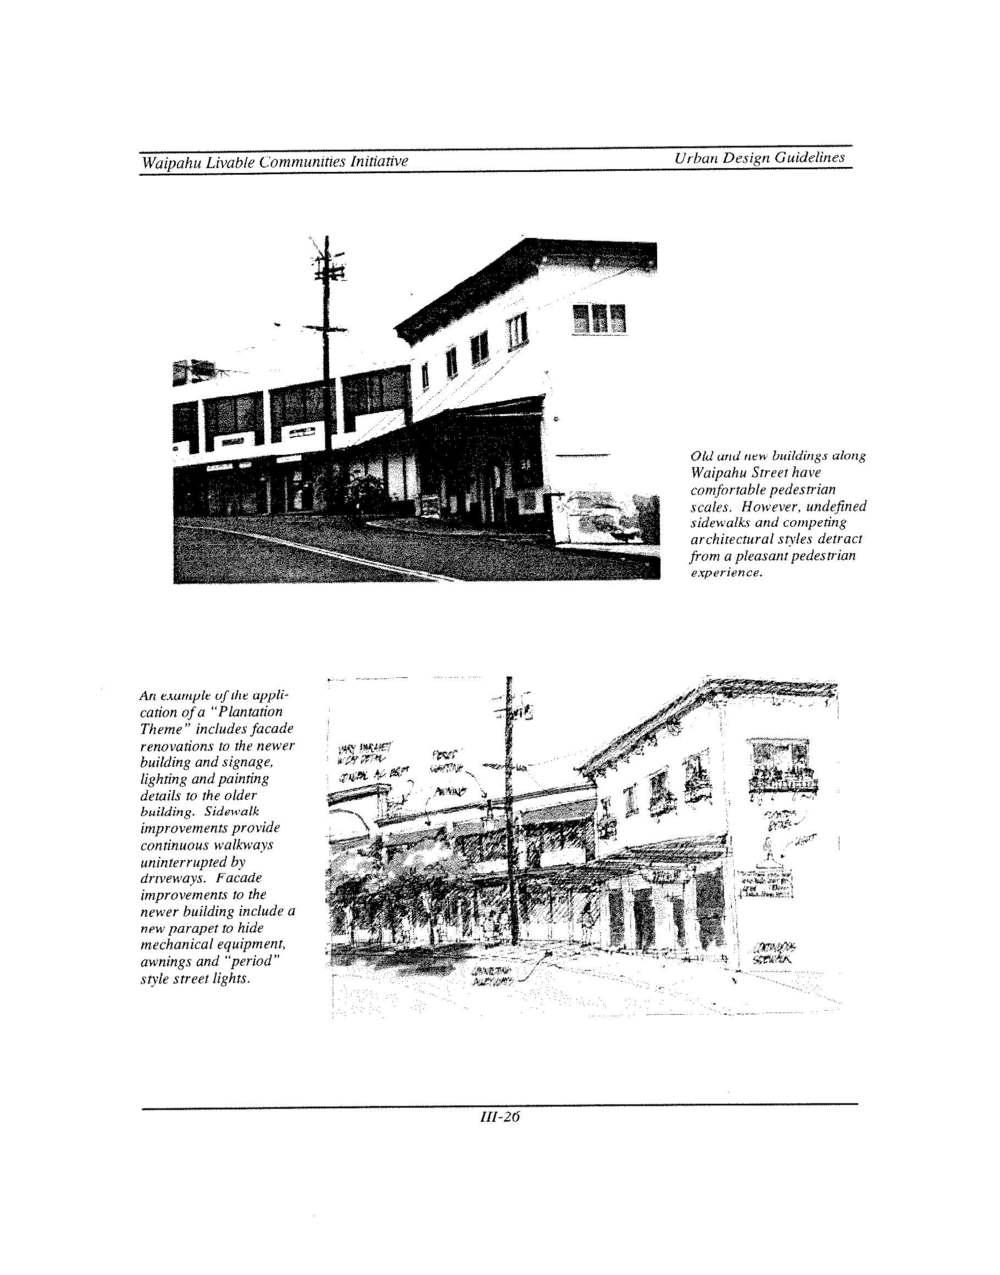 160531_WaipahuLivableCommunities(1998)_Page_116.jpg